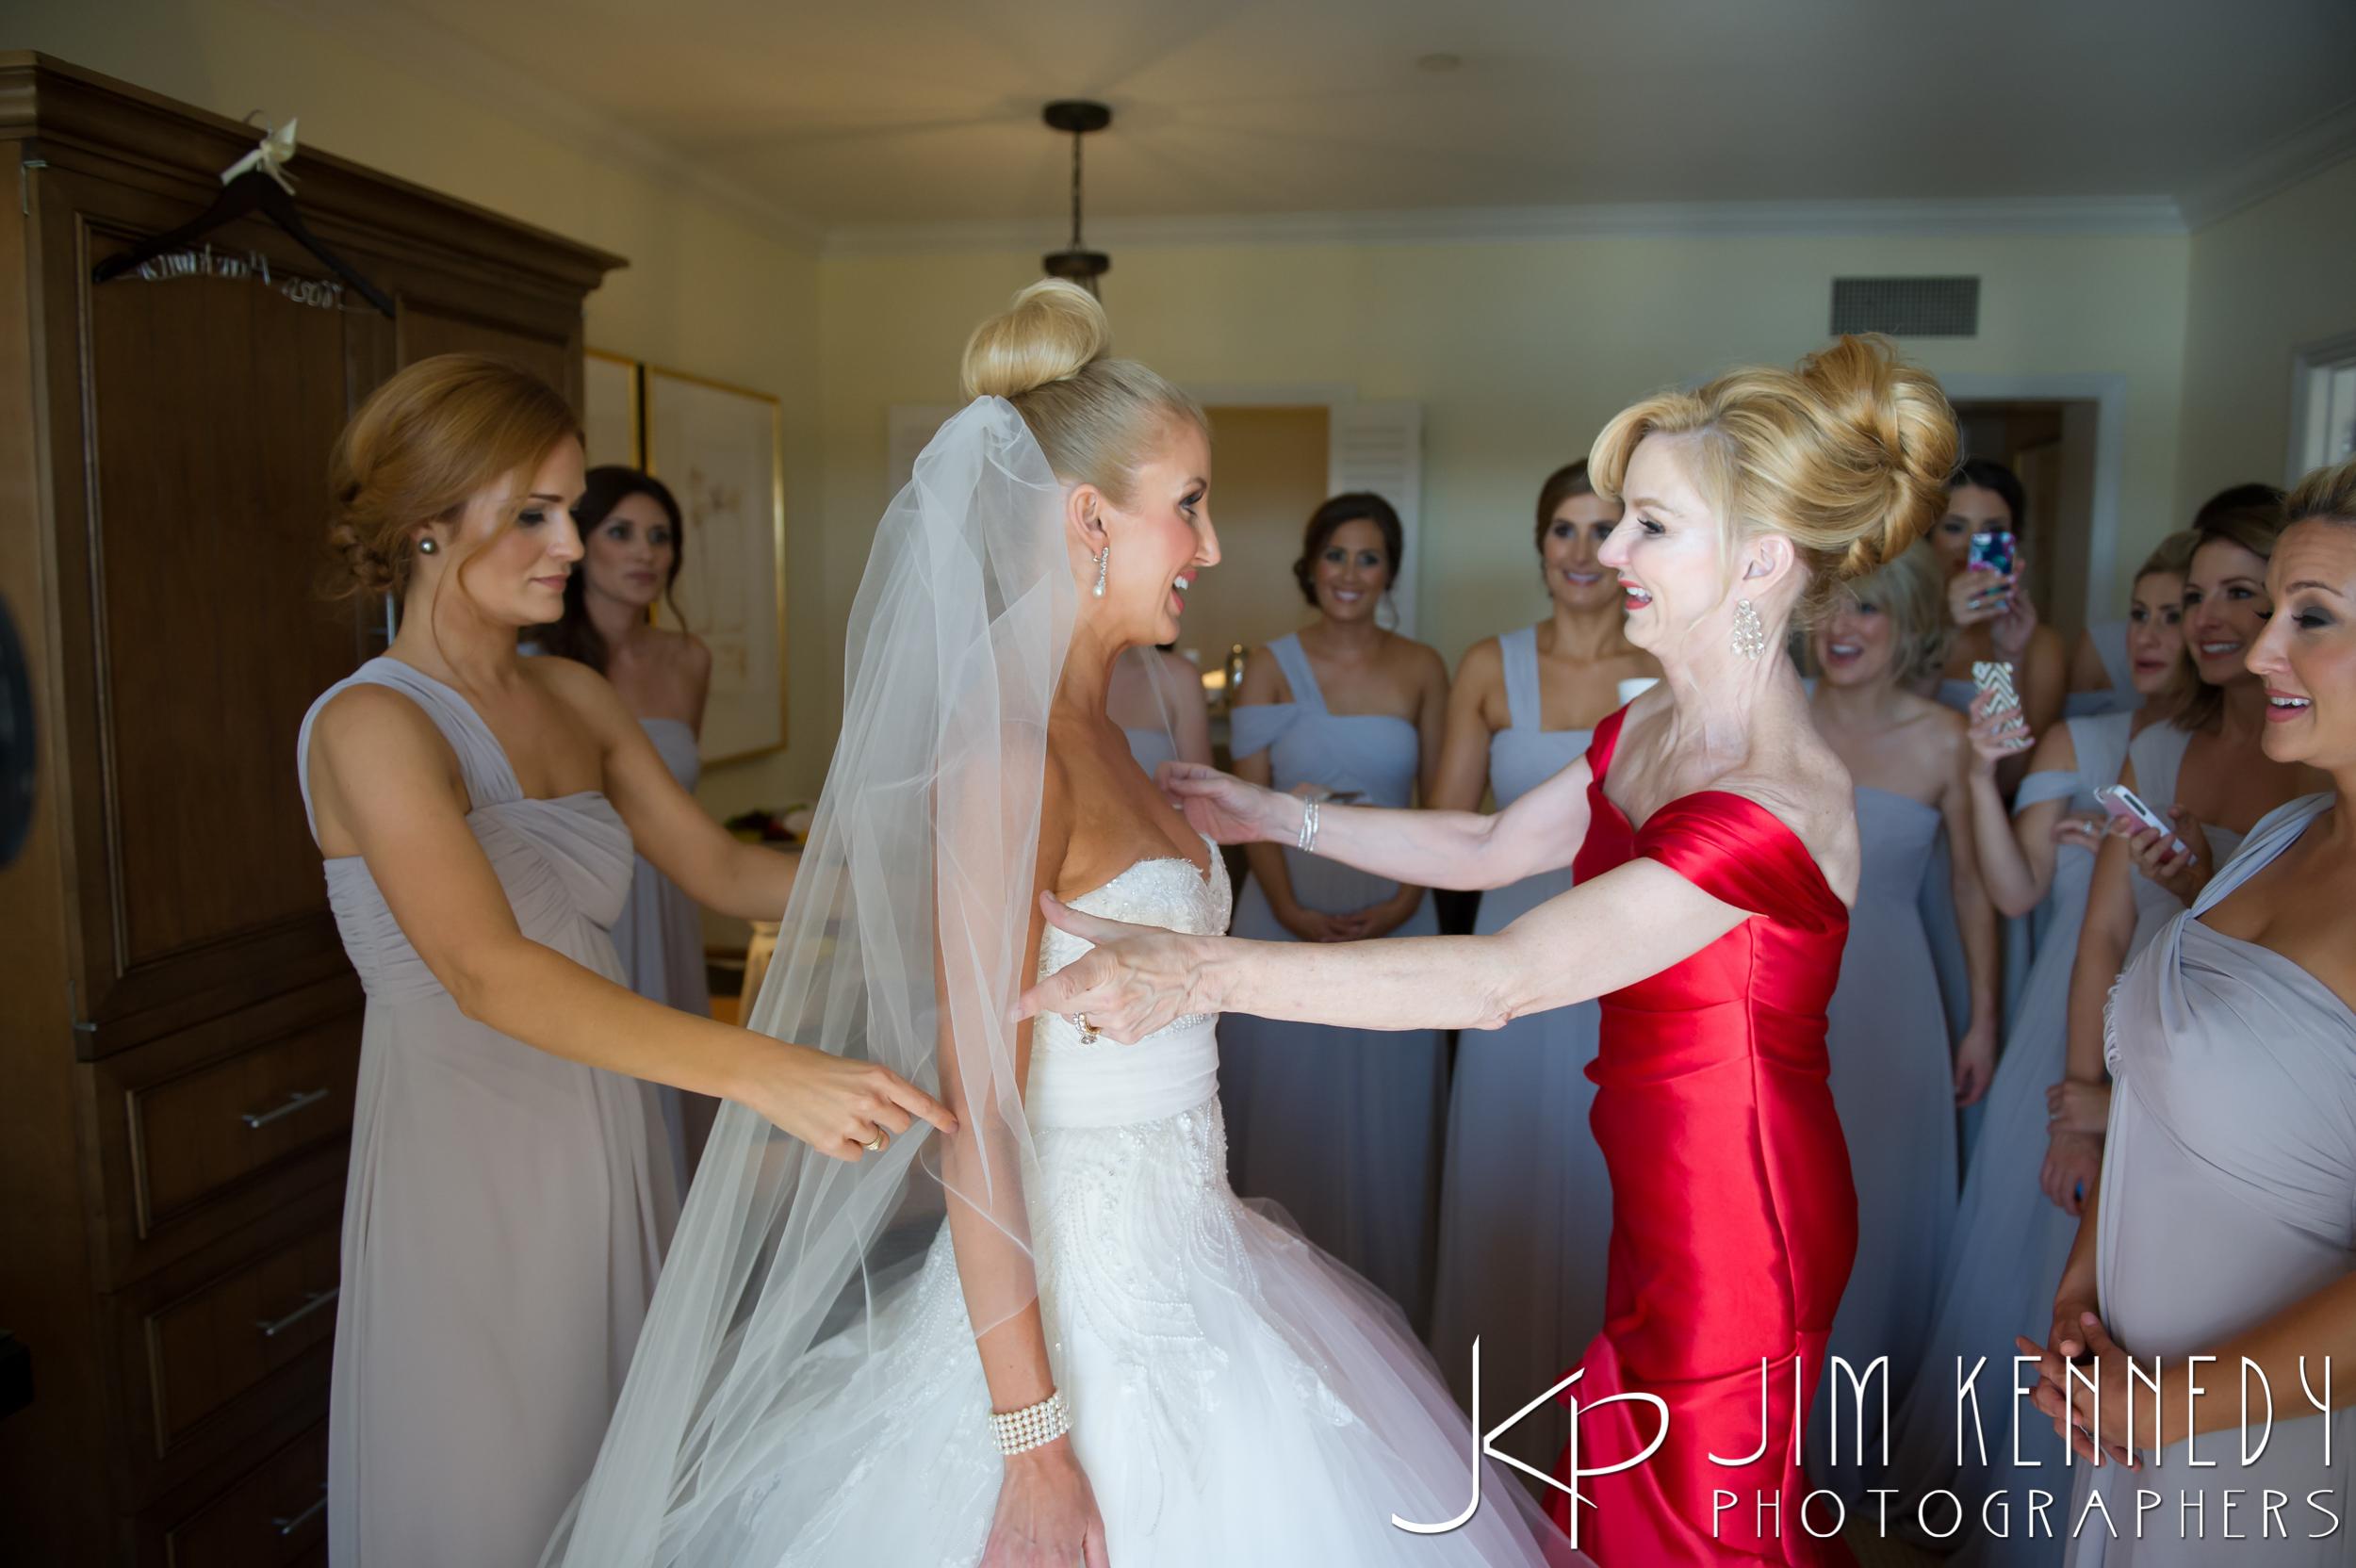 balboa-bay-resort-wedding-photography_0027.JPG